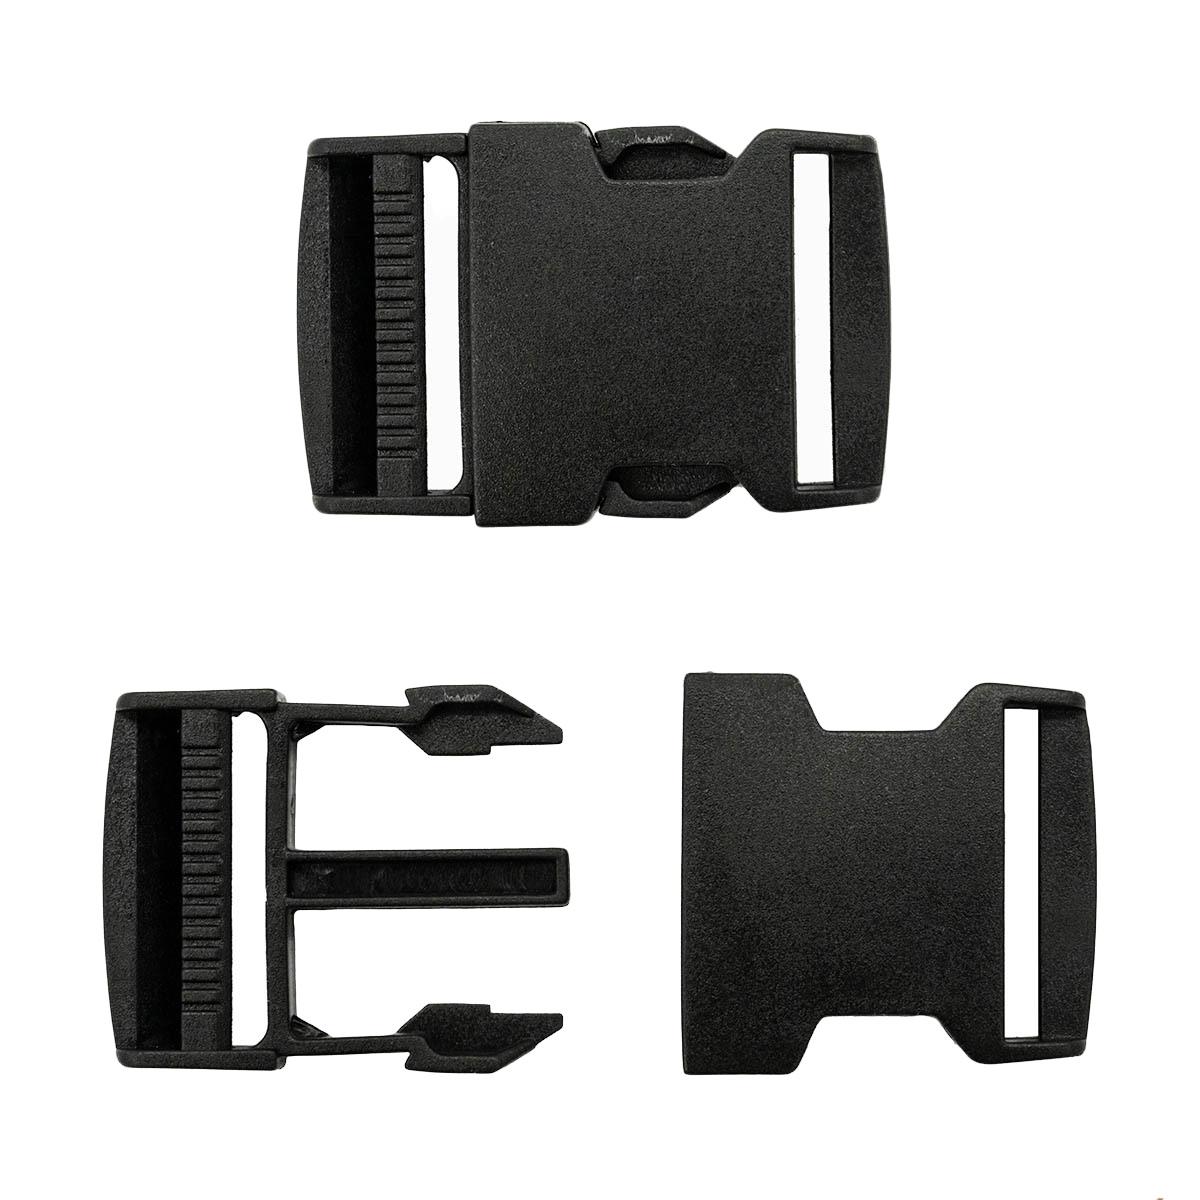 138A-002 Фастекс, черный, 38 мм, Hobby&Pro